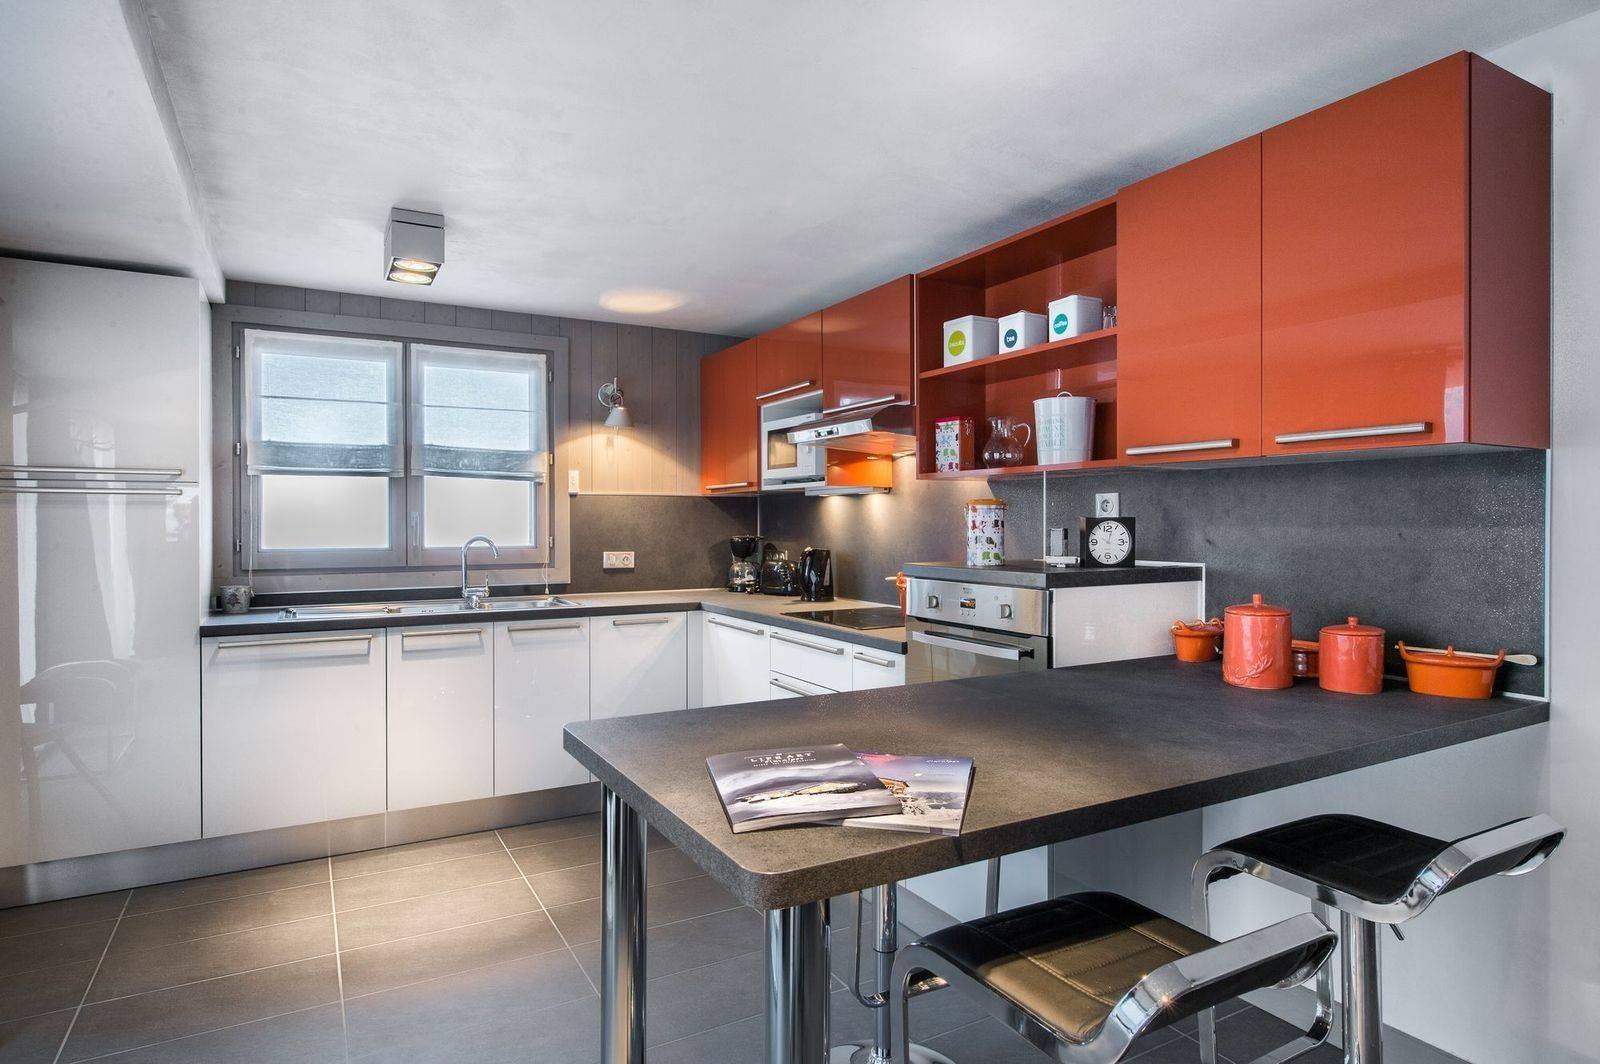 Courchevel 1650 Location Appartement Luxe Neustadelite Cuisine